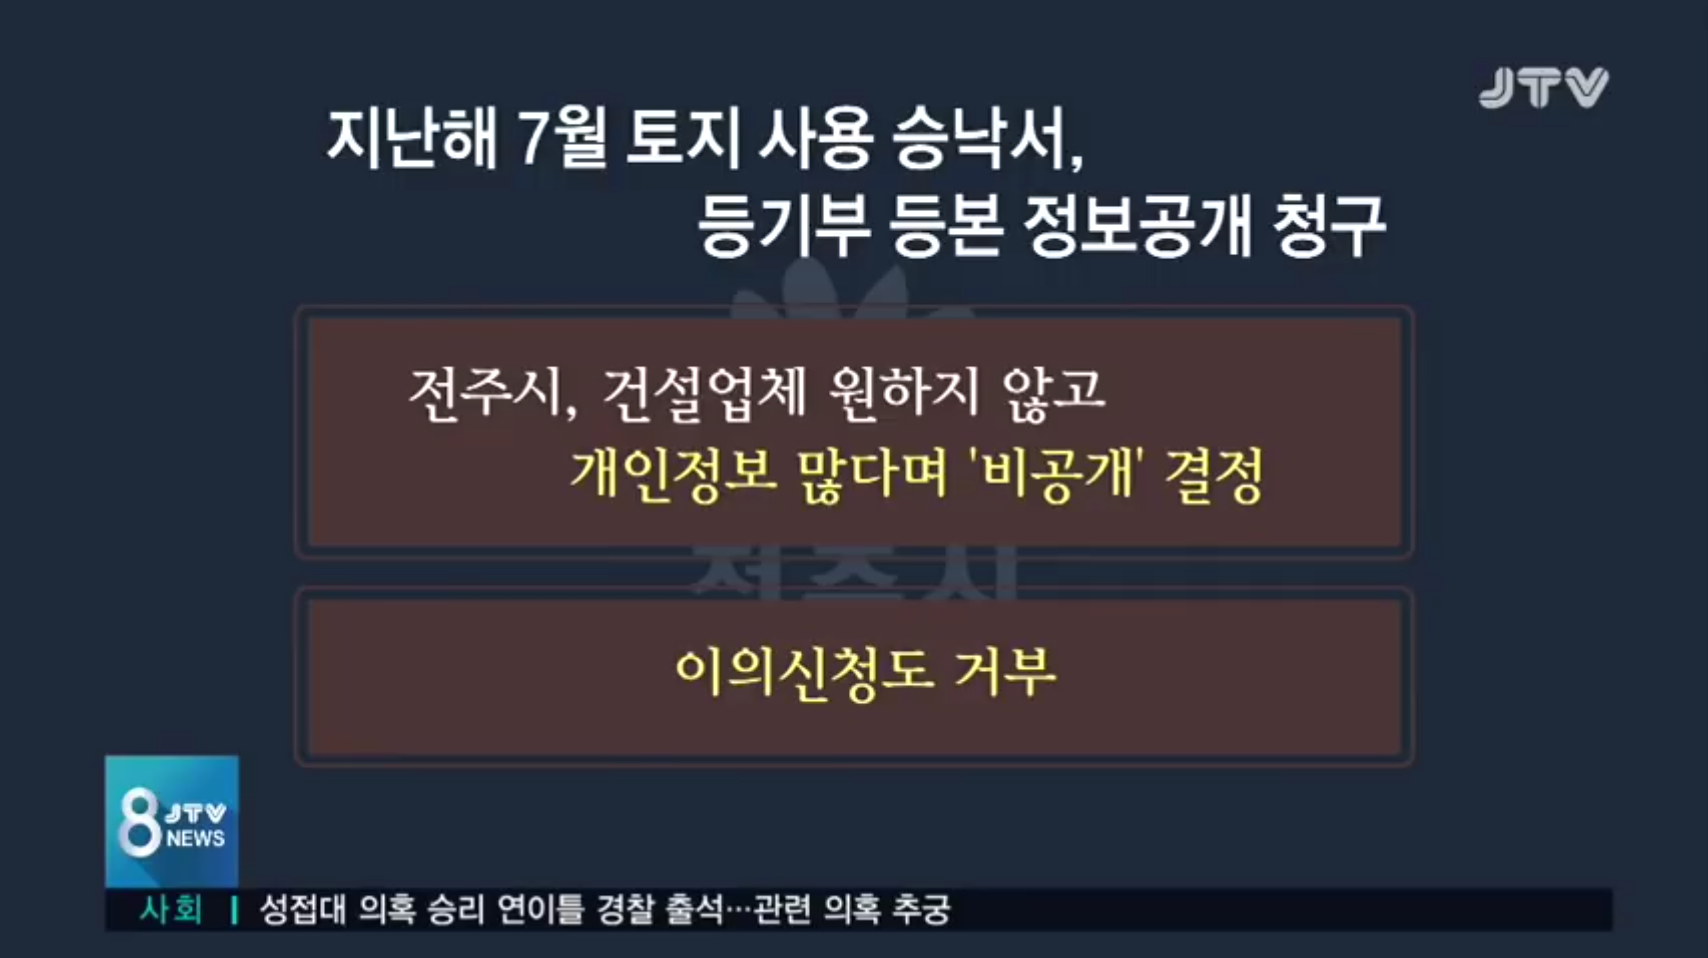 [19.4.24 JTV] 전주시, 아파트재개발 승인 허술, 정보공개 거부로 시민만 골탕7.png